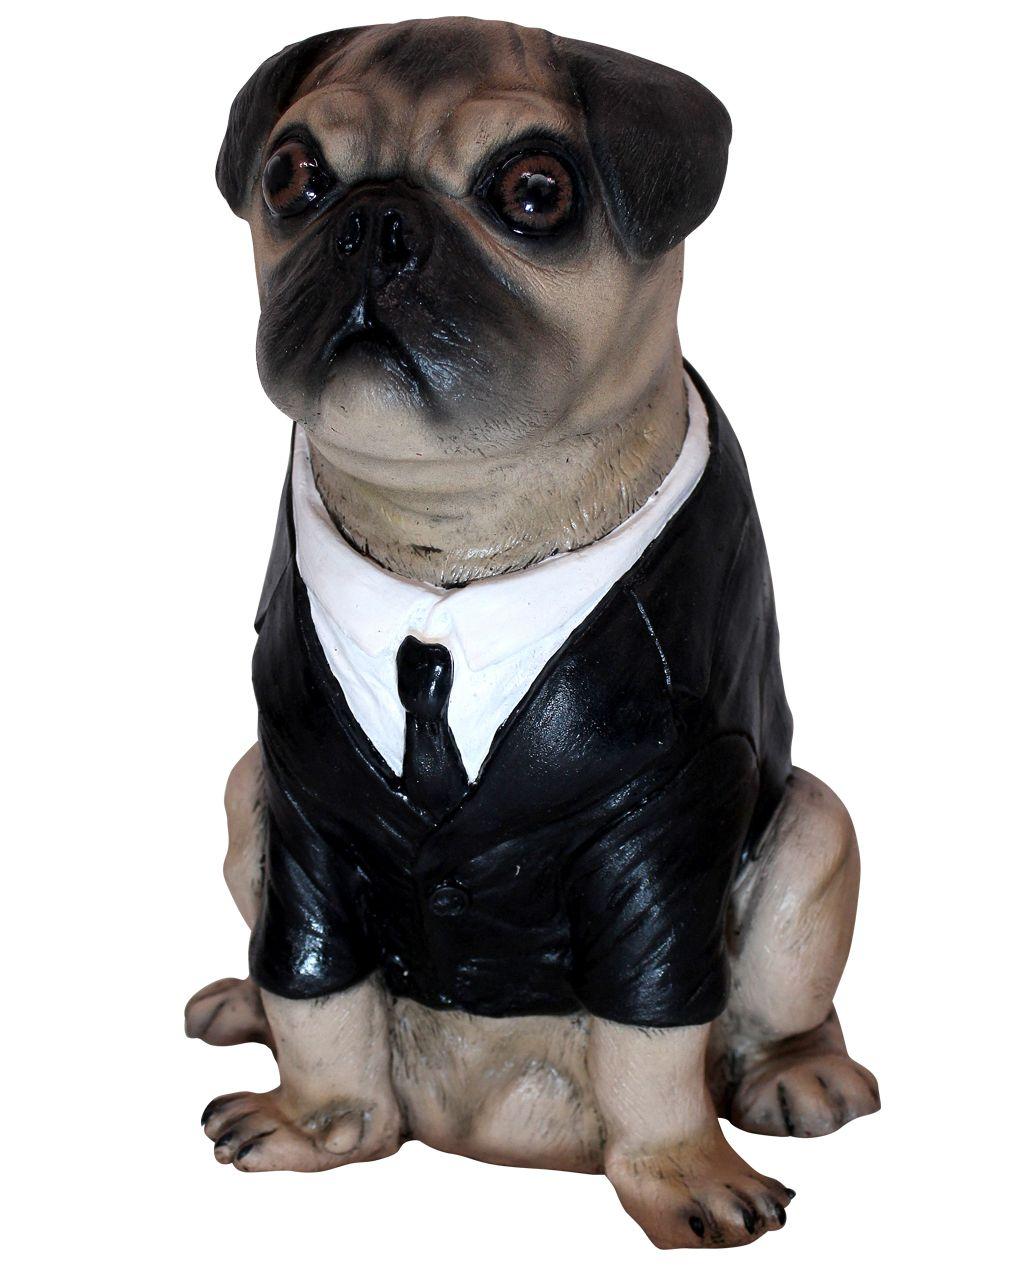 M I B Frank Der Mops Frank The Pug Pugs Dog Jokes